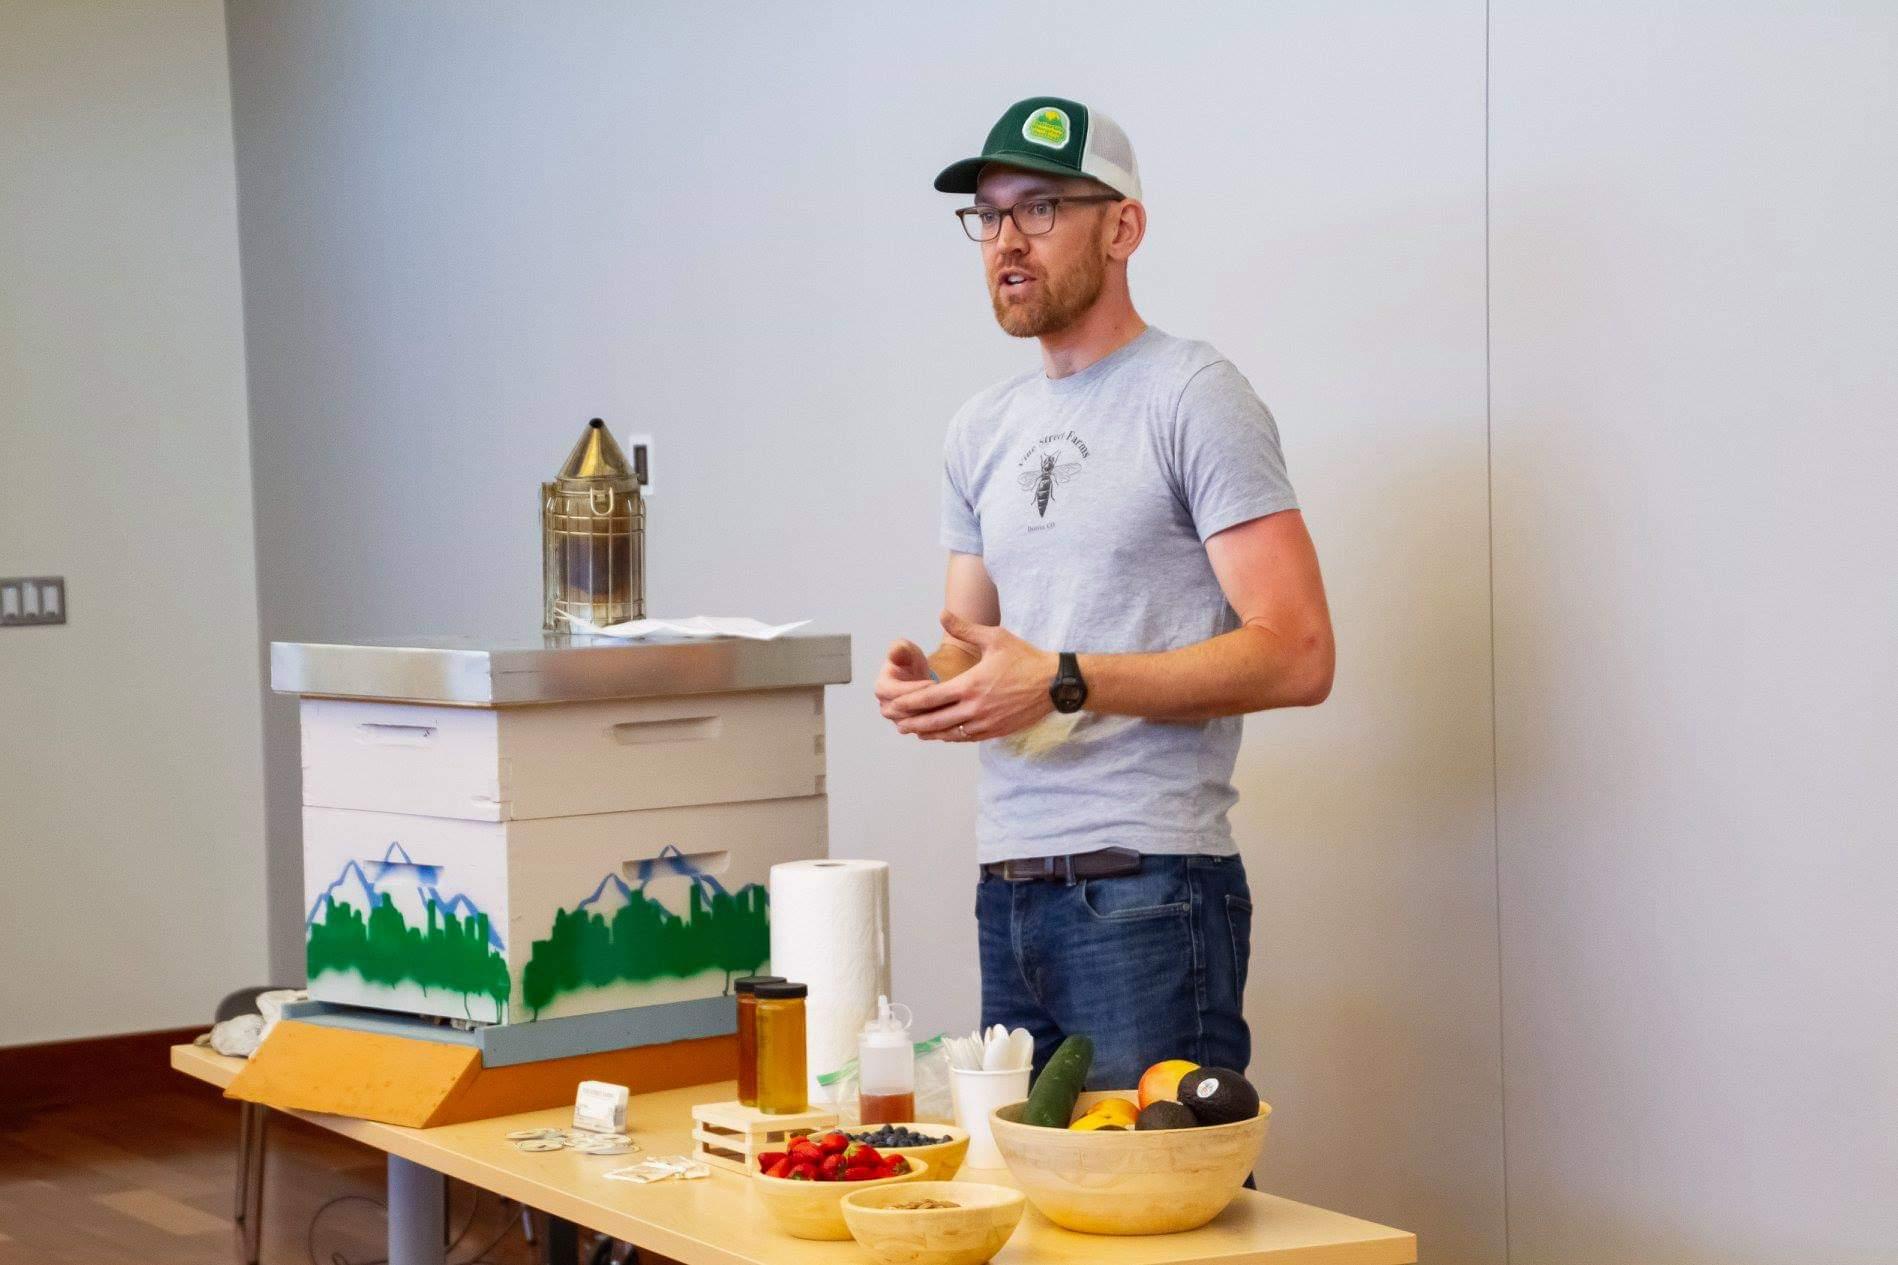 Beekeeping presentation